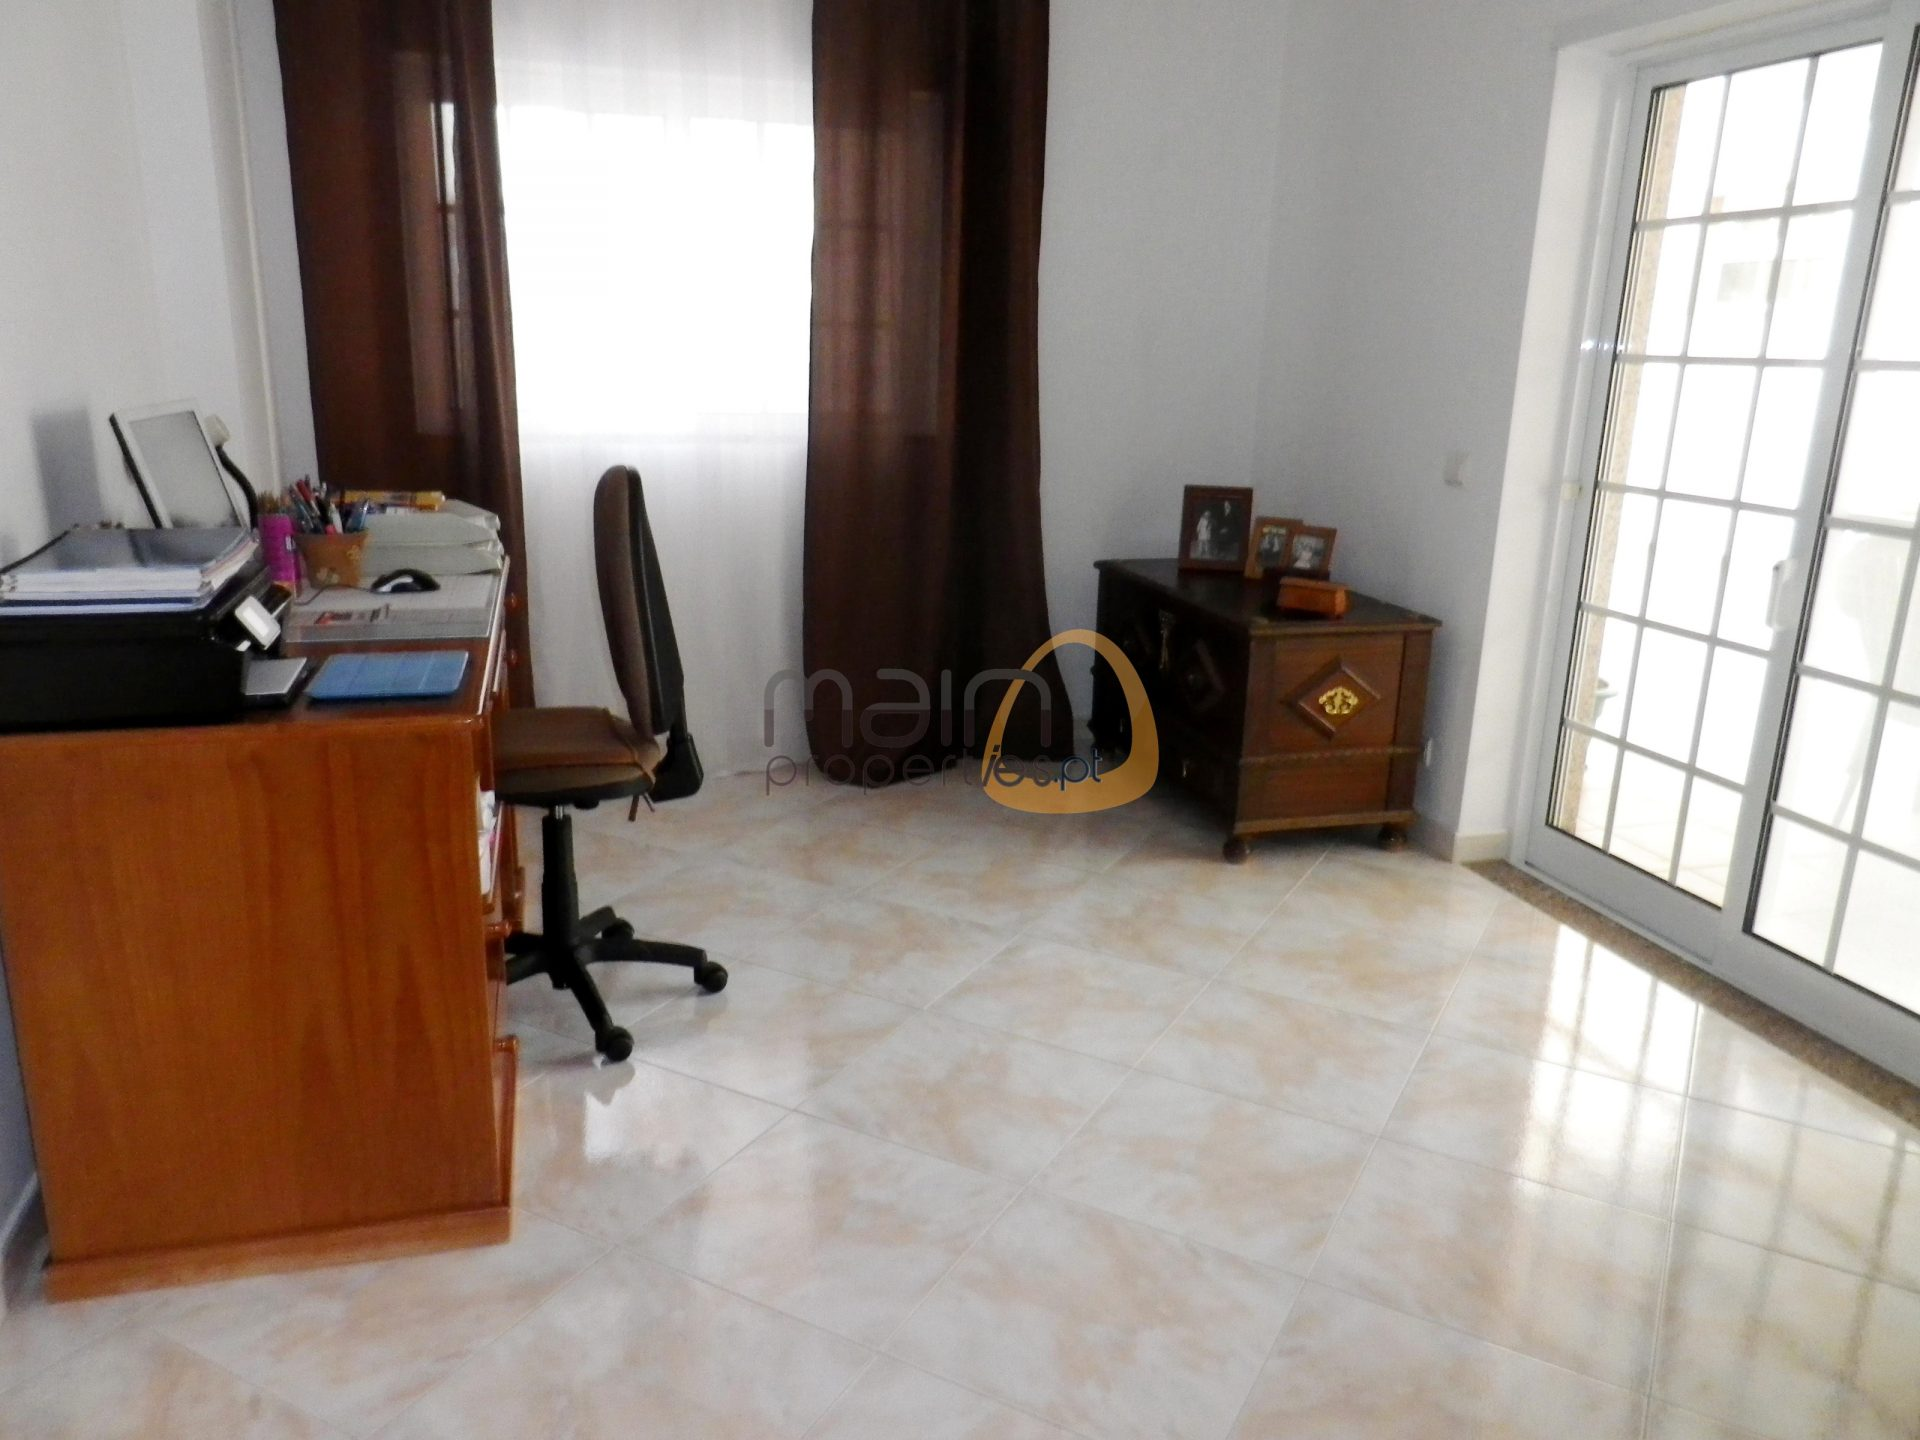 4 bedroom apartment faro_7